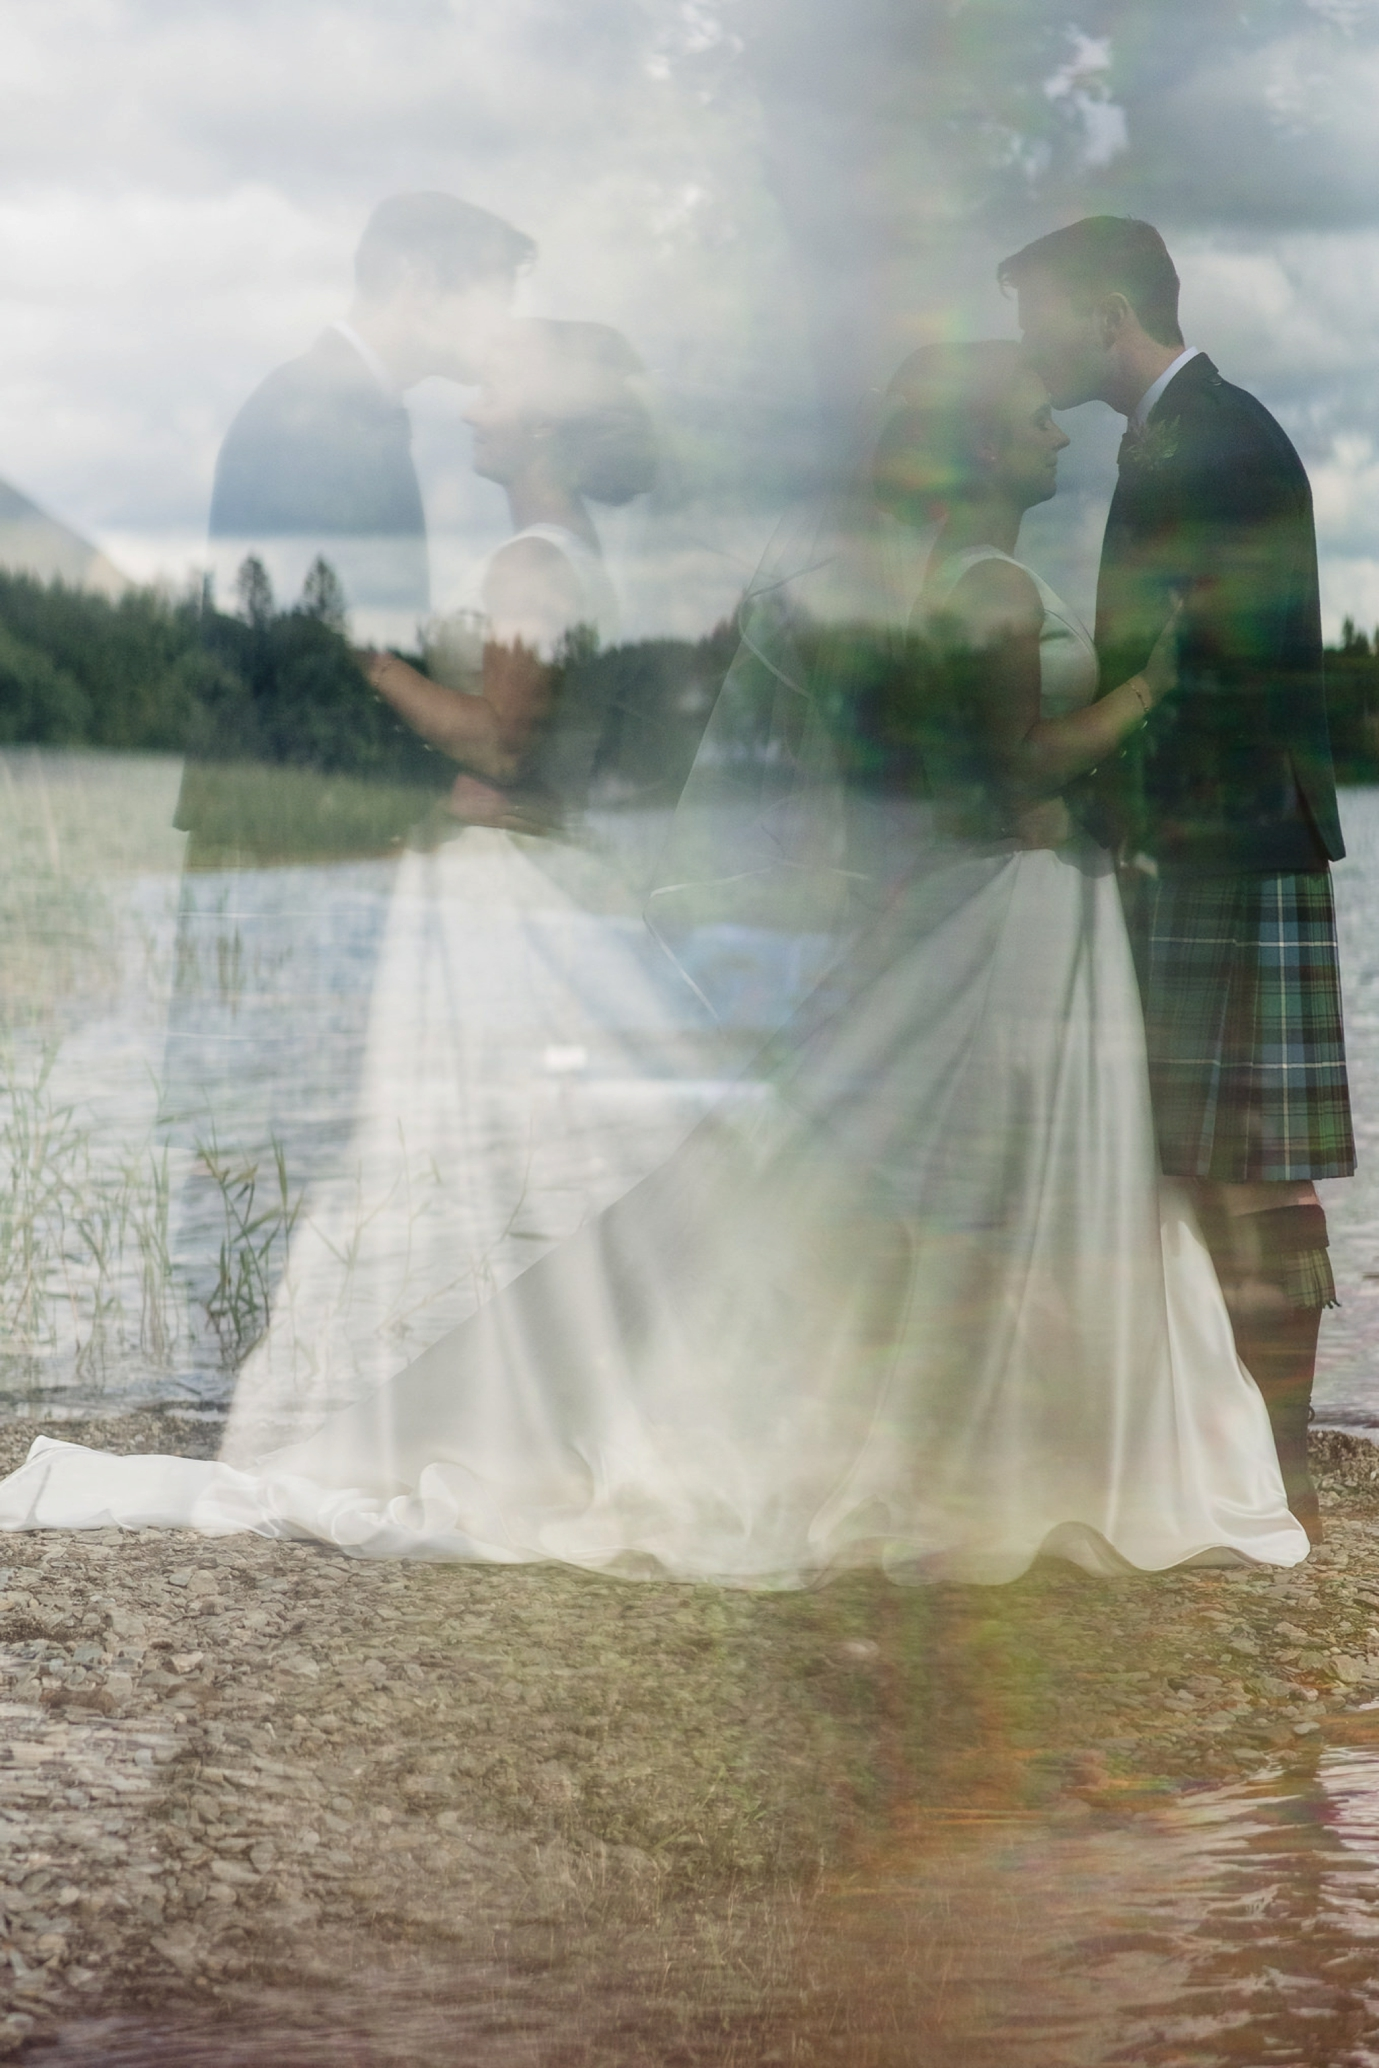 20170730_euan robertson weddings_058_WEB.jpg